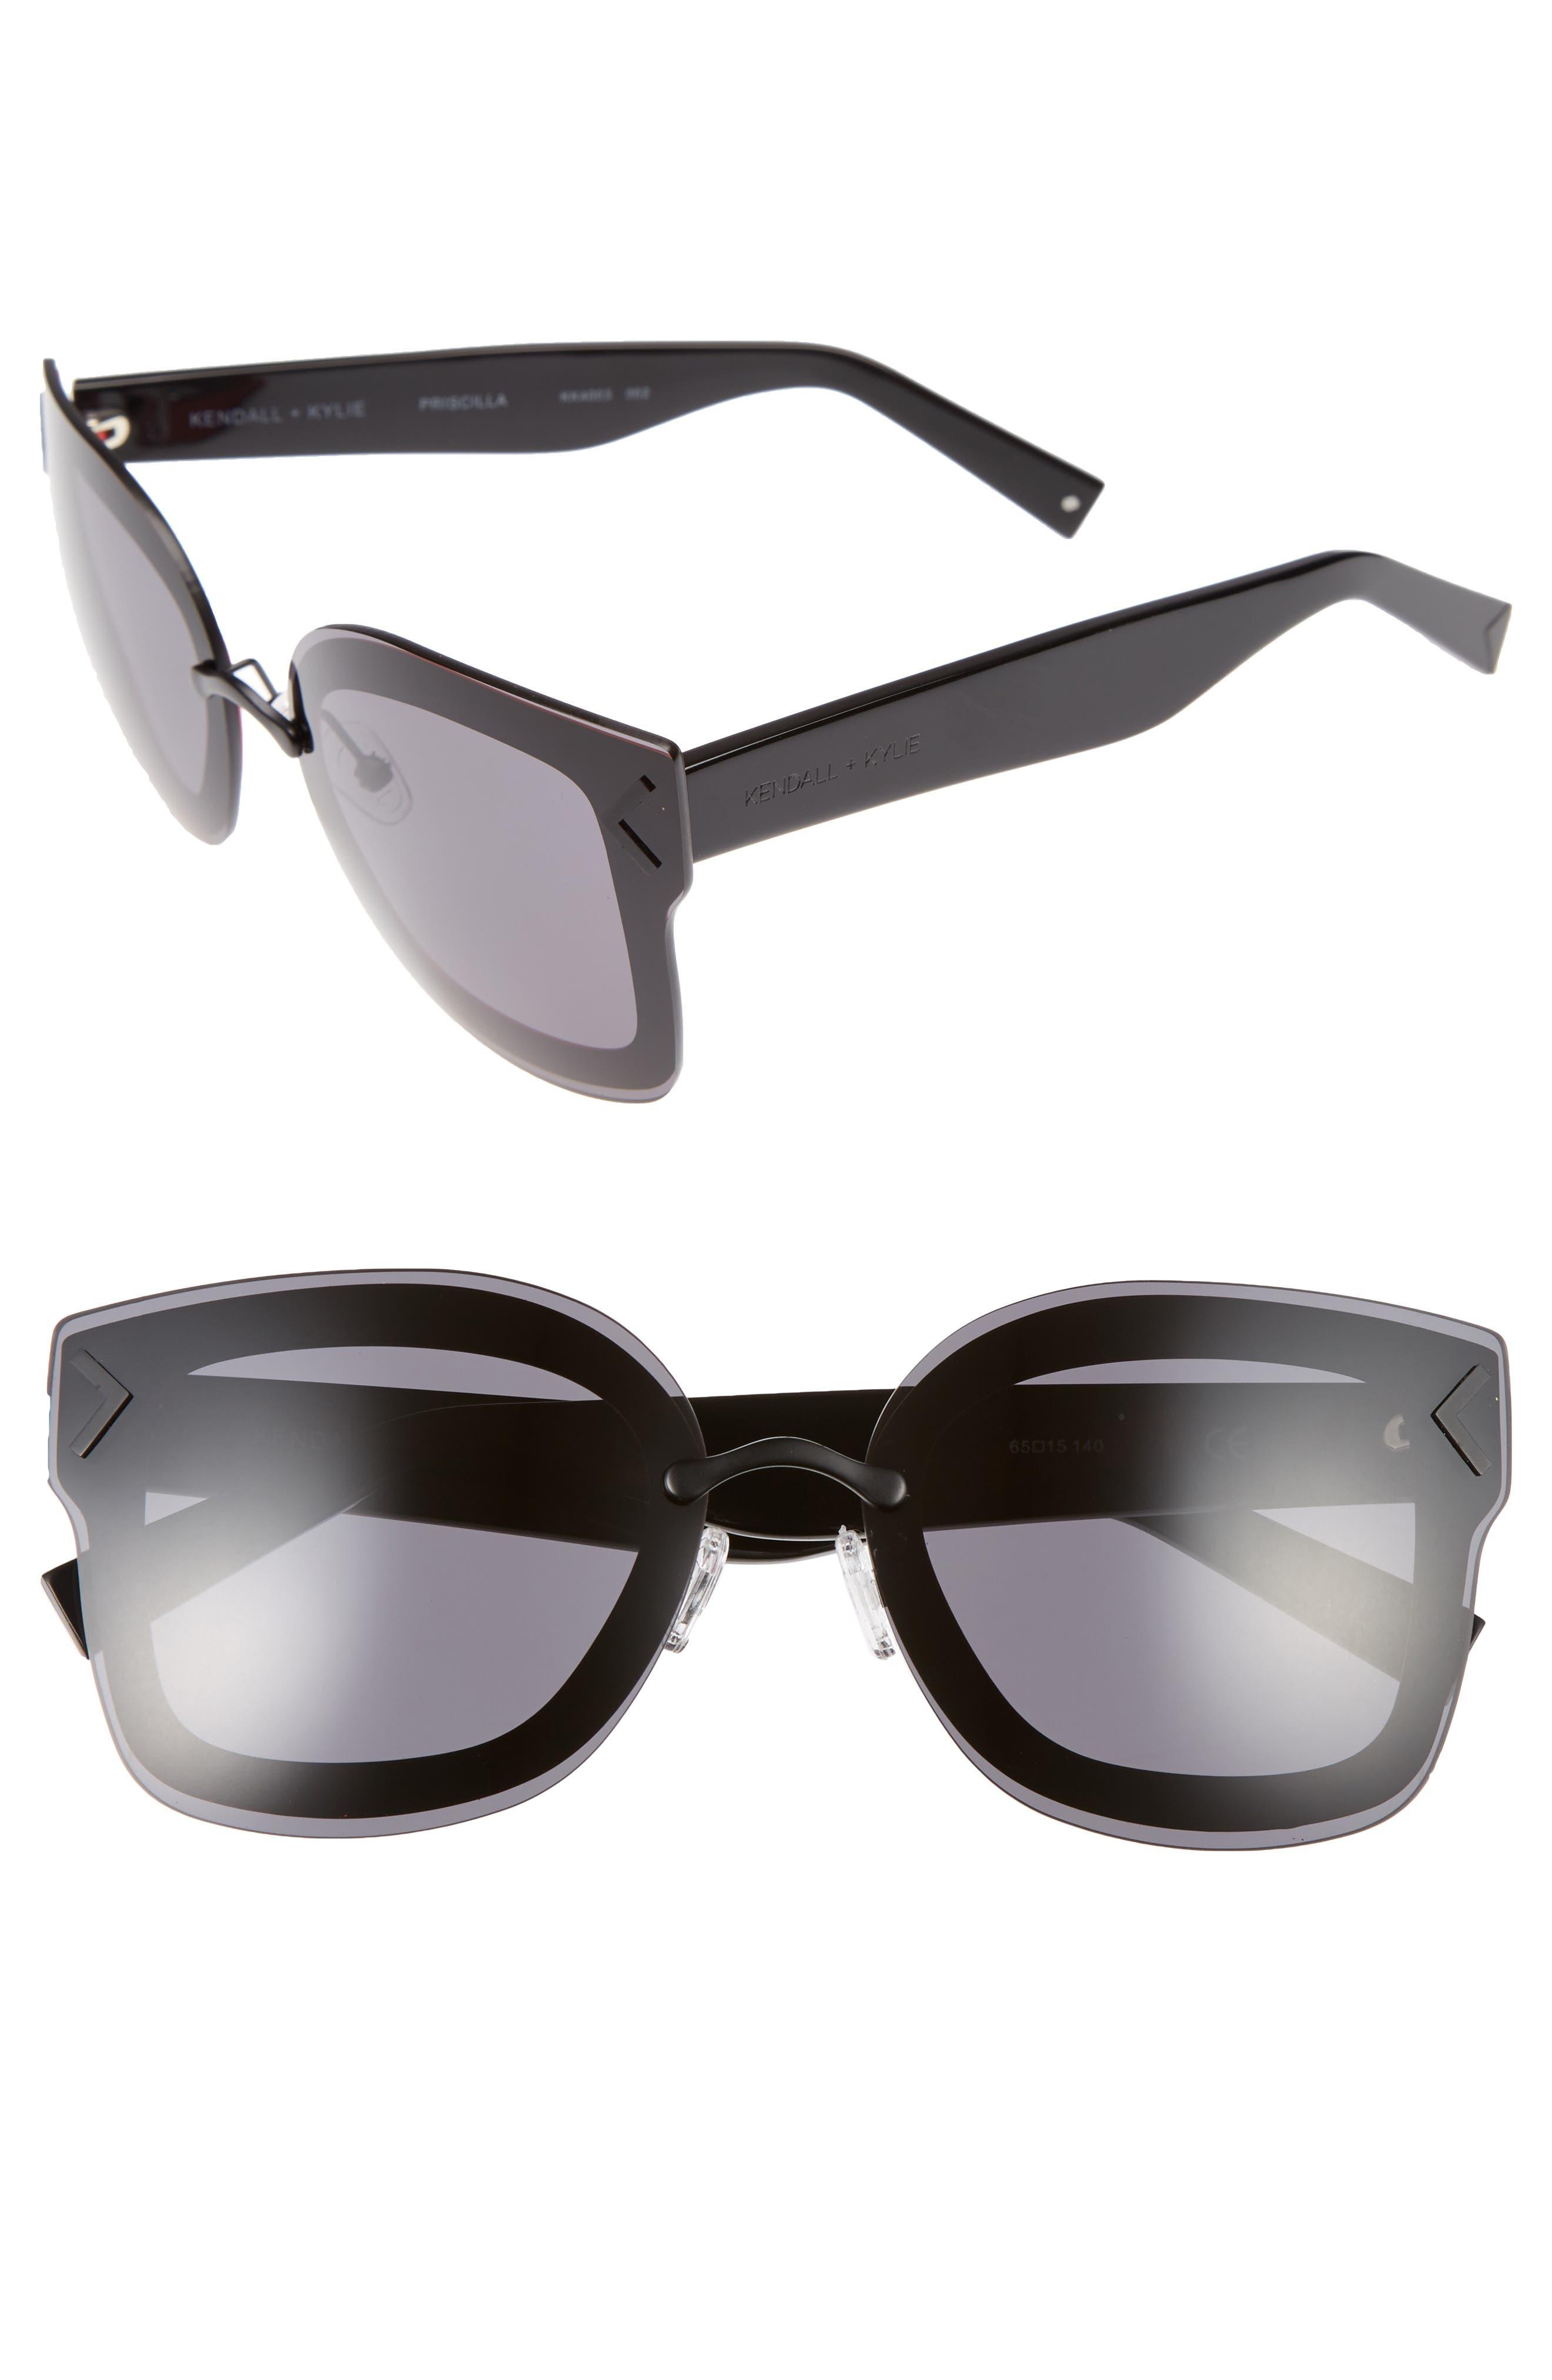 Priscilla 65mm Butterfly Sunglasses,                             Alternate thumbnail 3, color,                             001